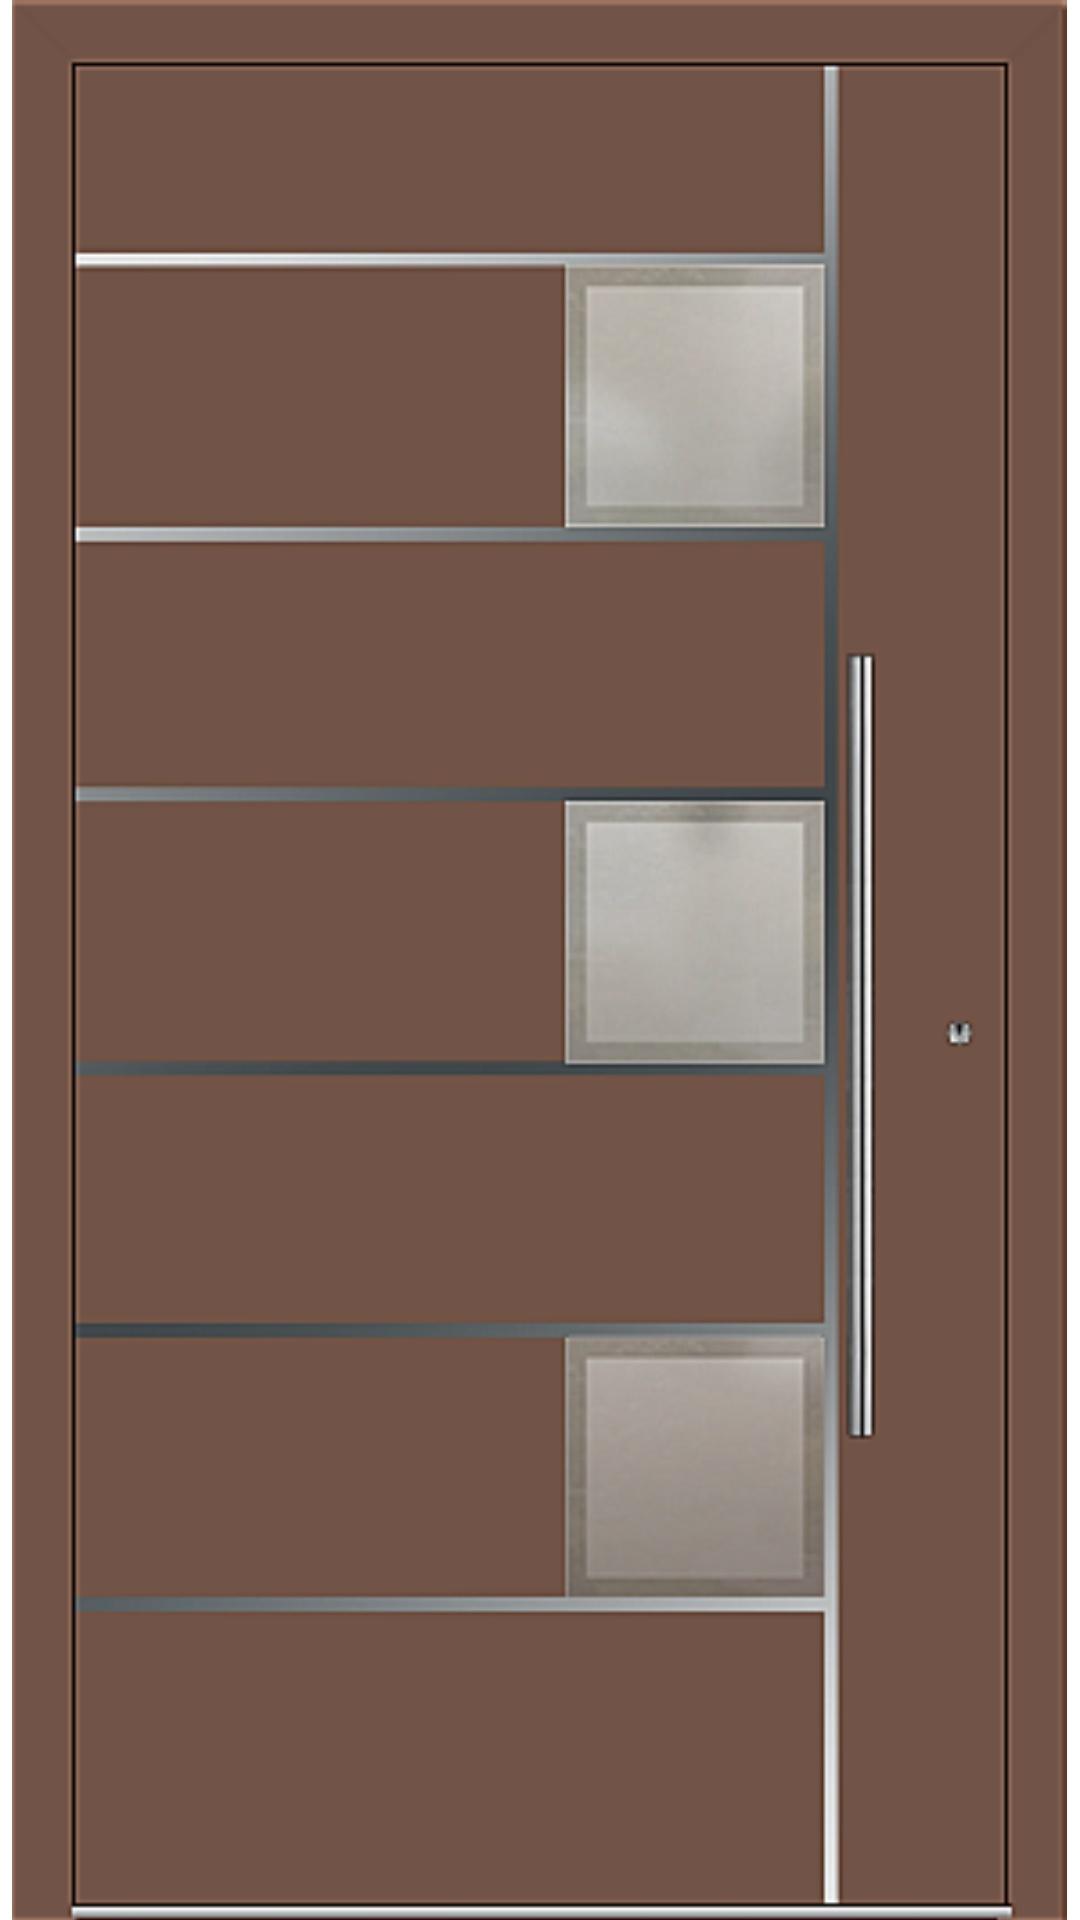 PaXentrée Aluminium Haustür M04341 lehmbraun